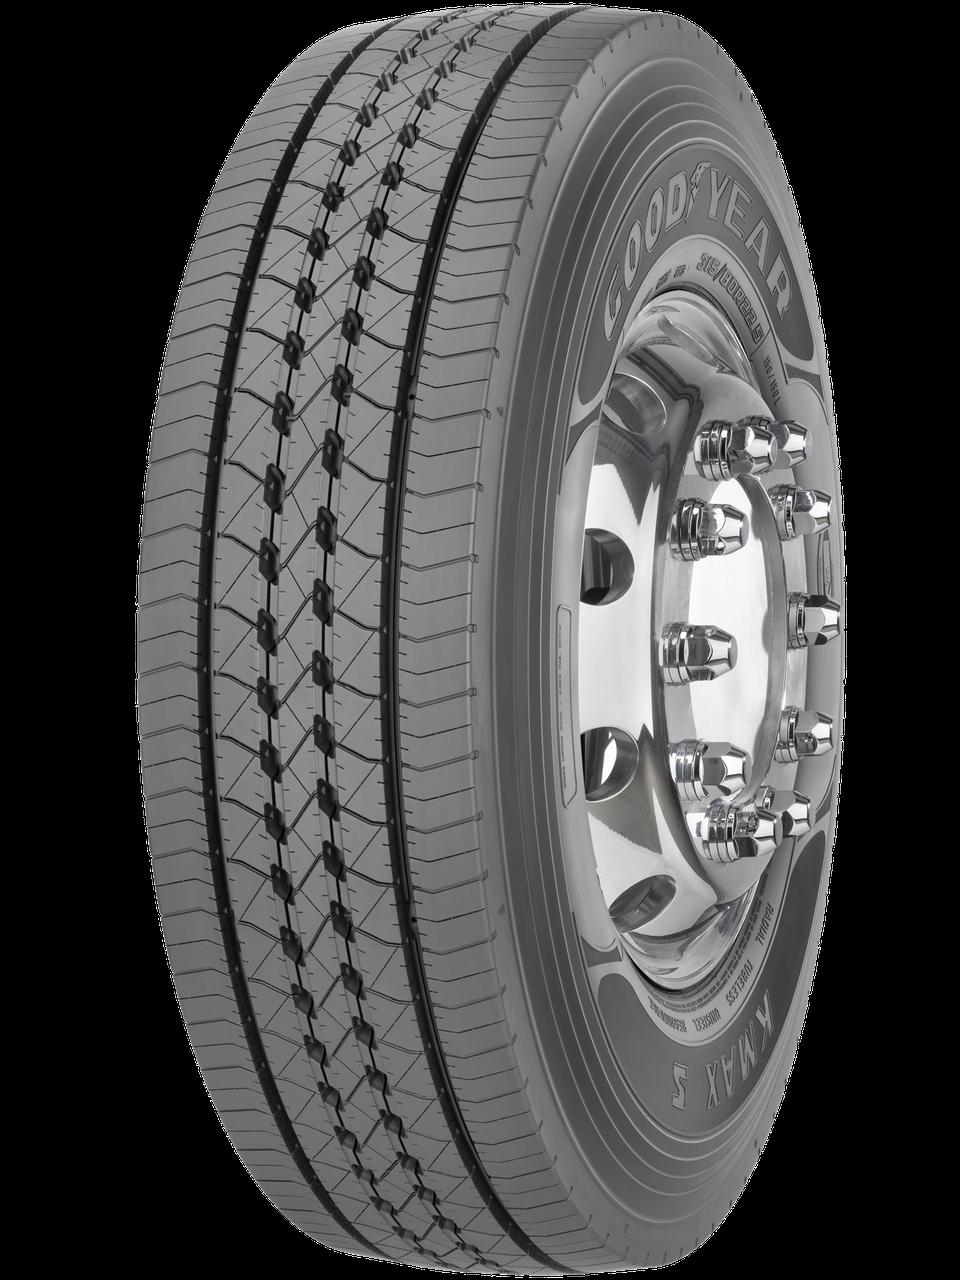 Грузовые шины Goodyear KMAX S, 315/60R22.5